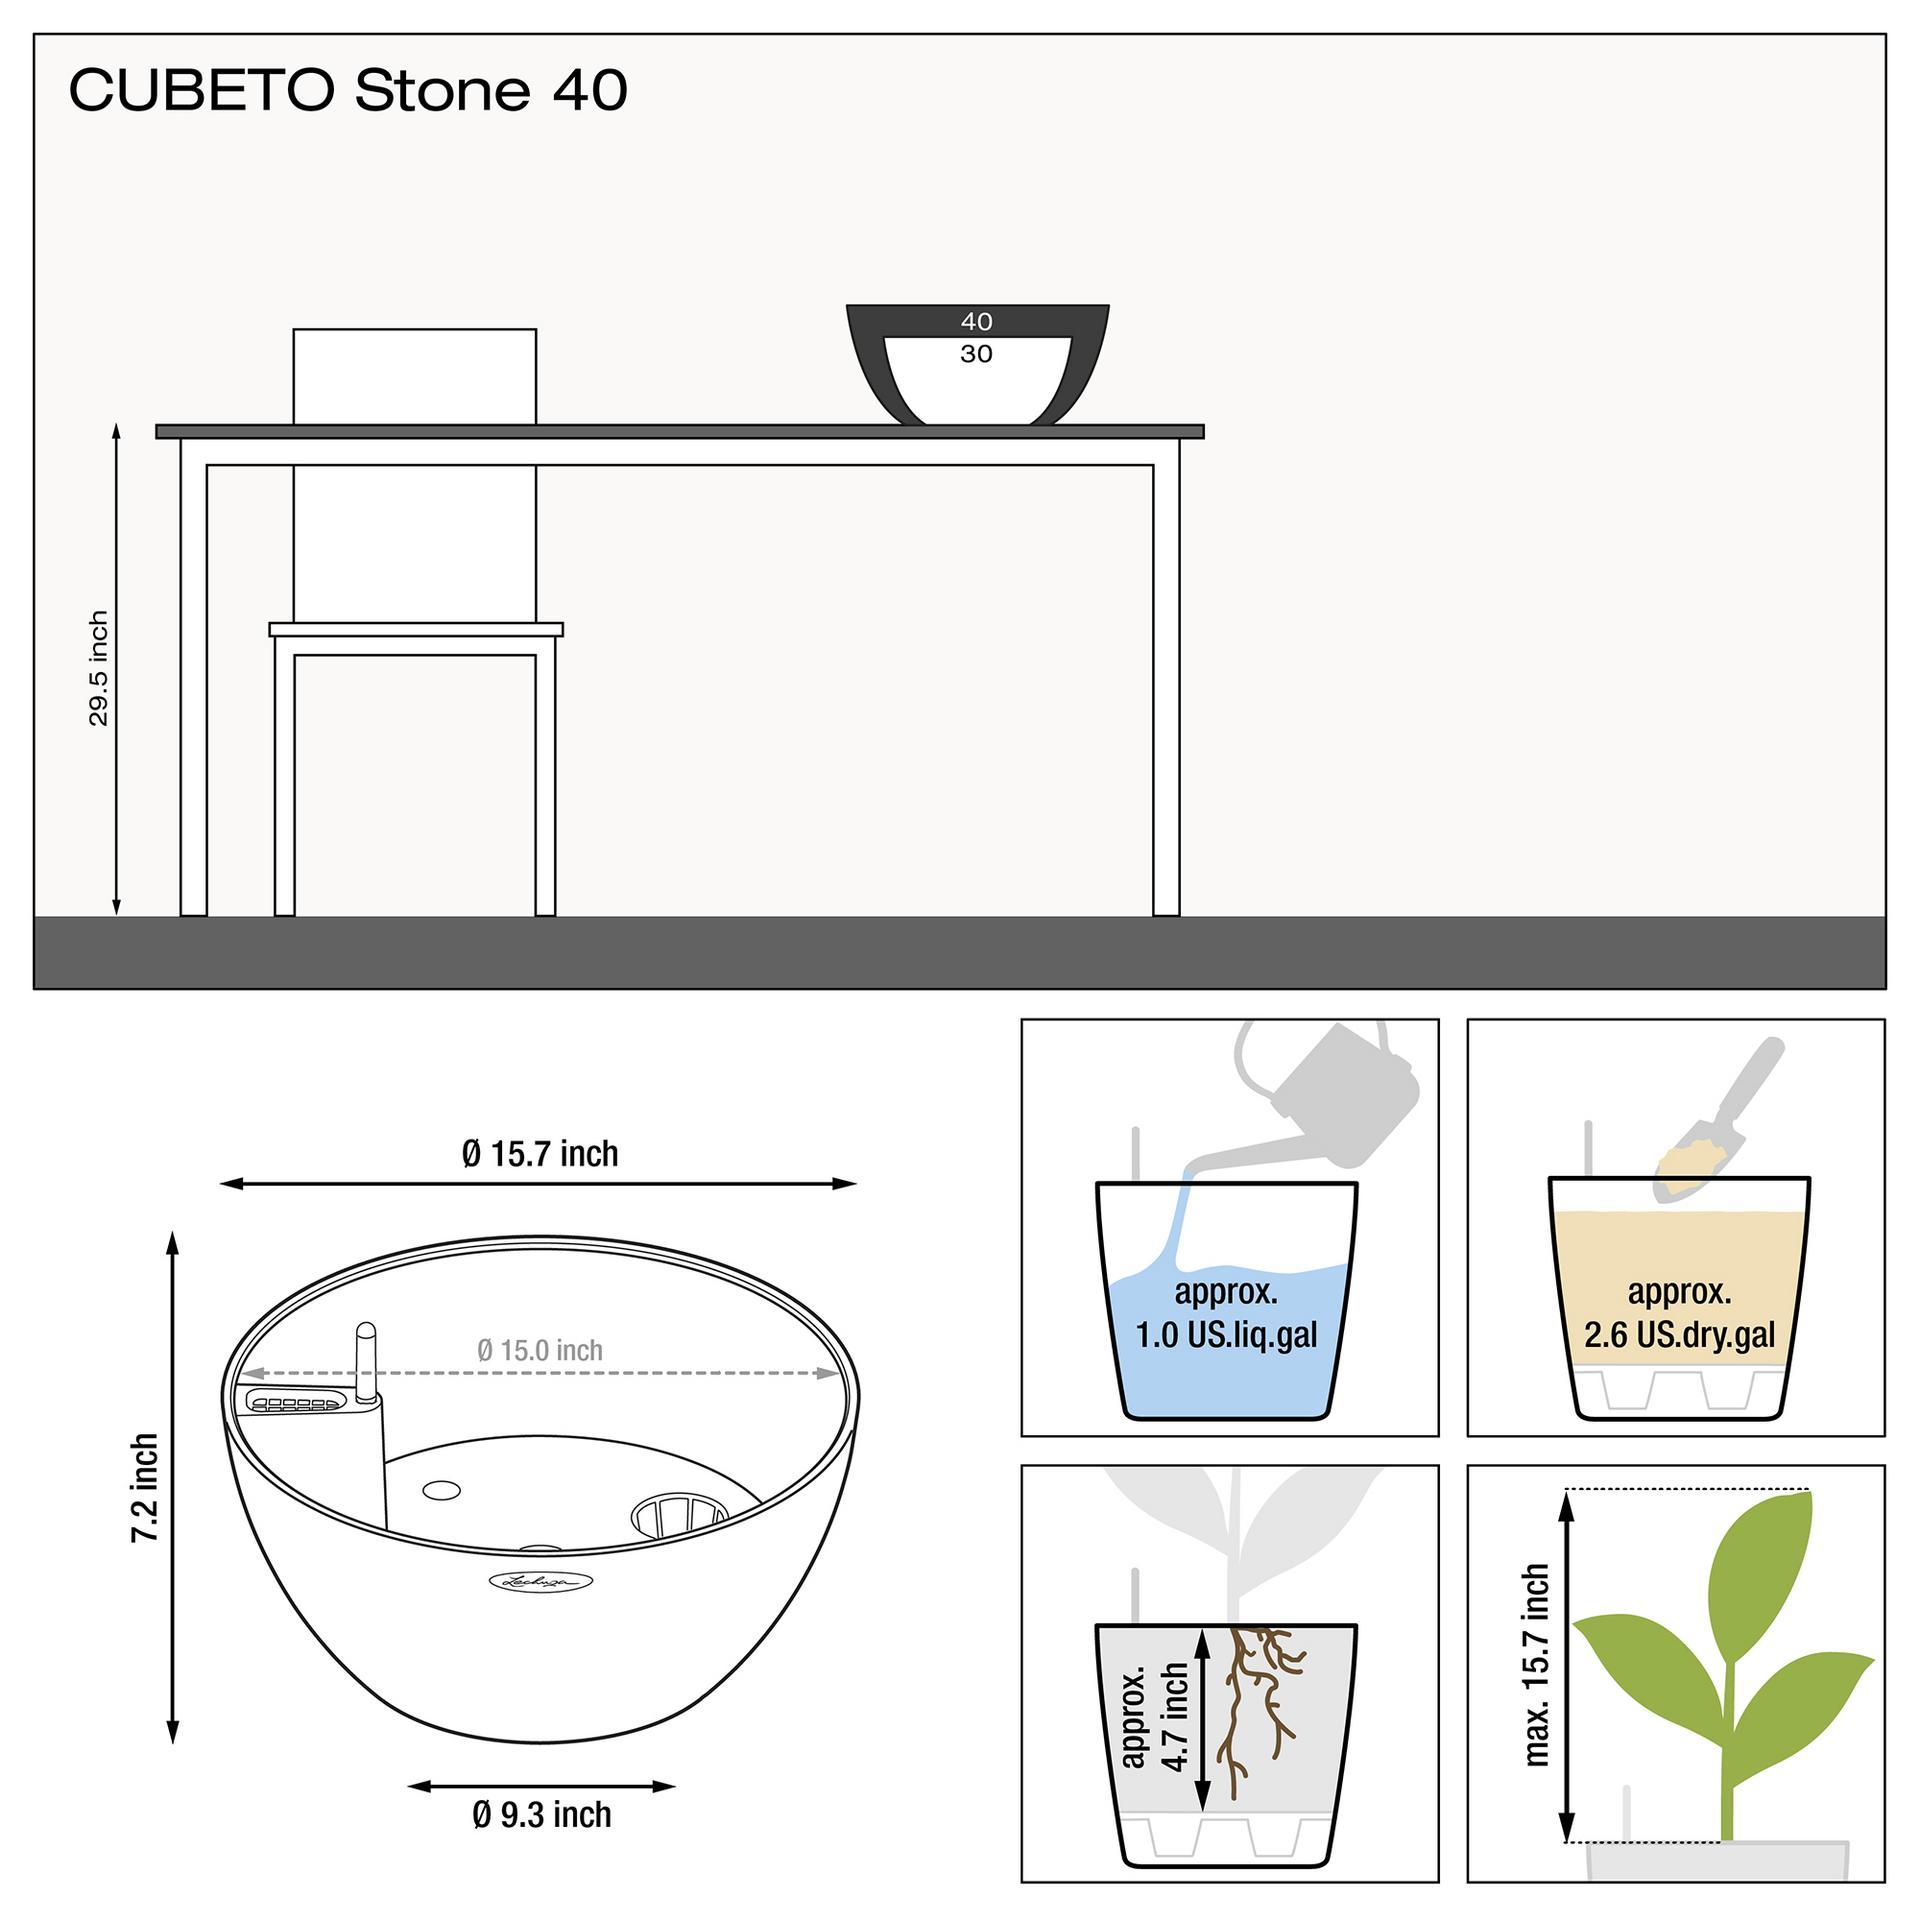 le_cubeto-stone40_product_addi_nz_us